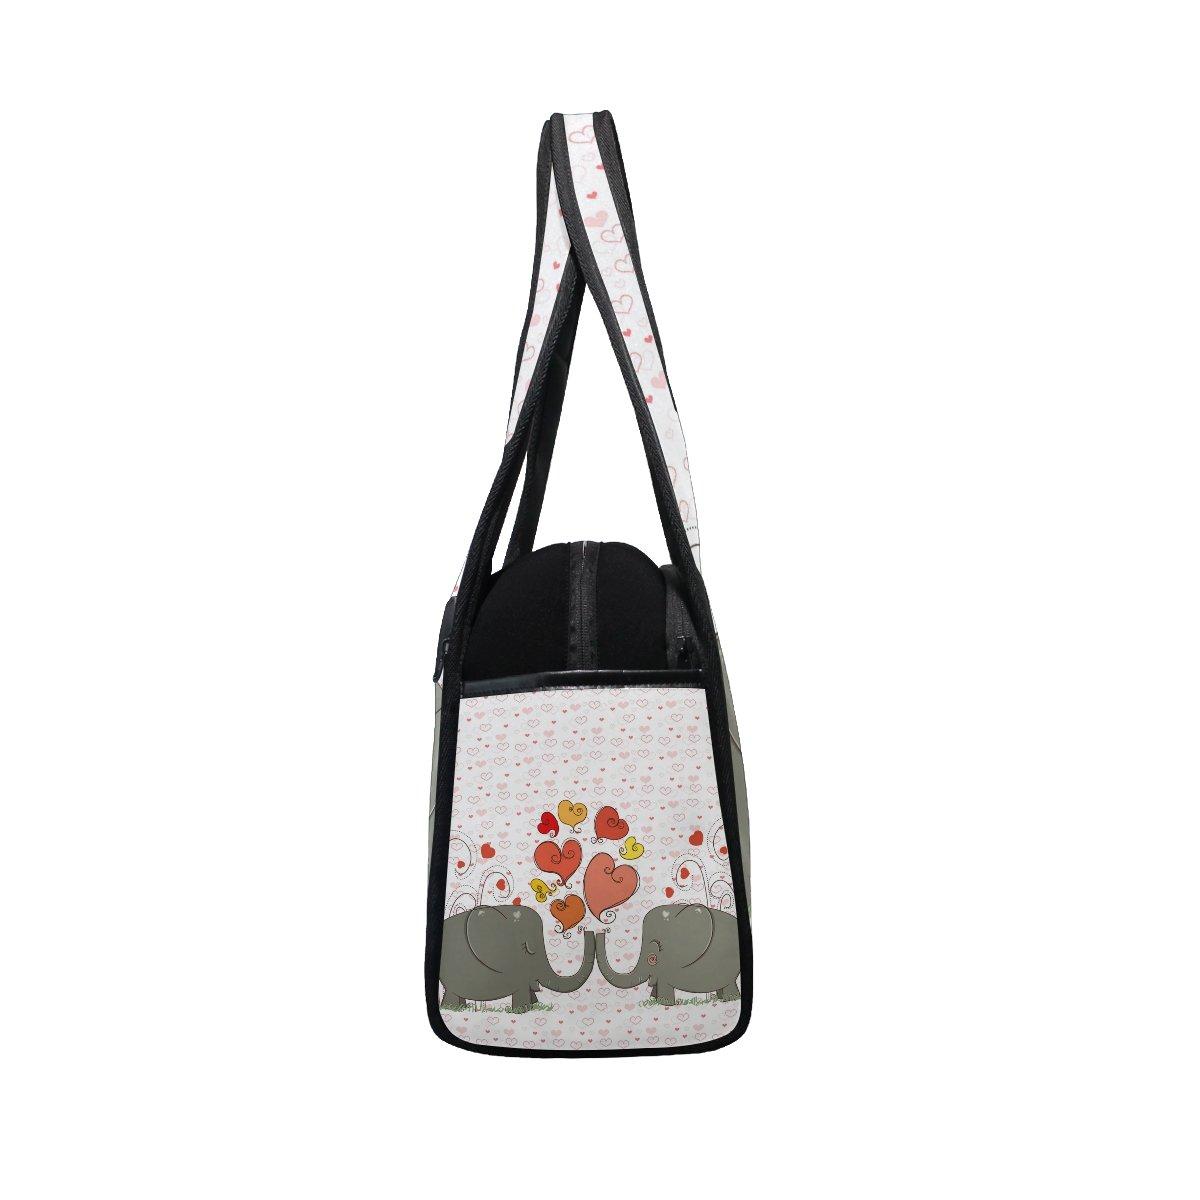 AHOMY Sports Gym Bag Elephant Love Heart Duffel Bag Travel Shoulder Bag by AHOMY (Image #3)